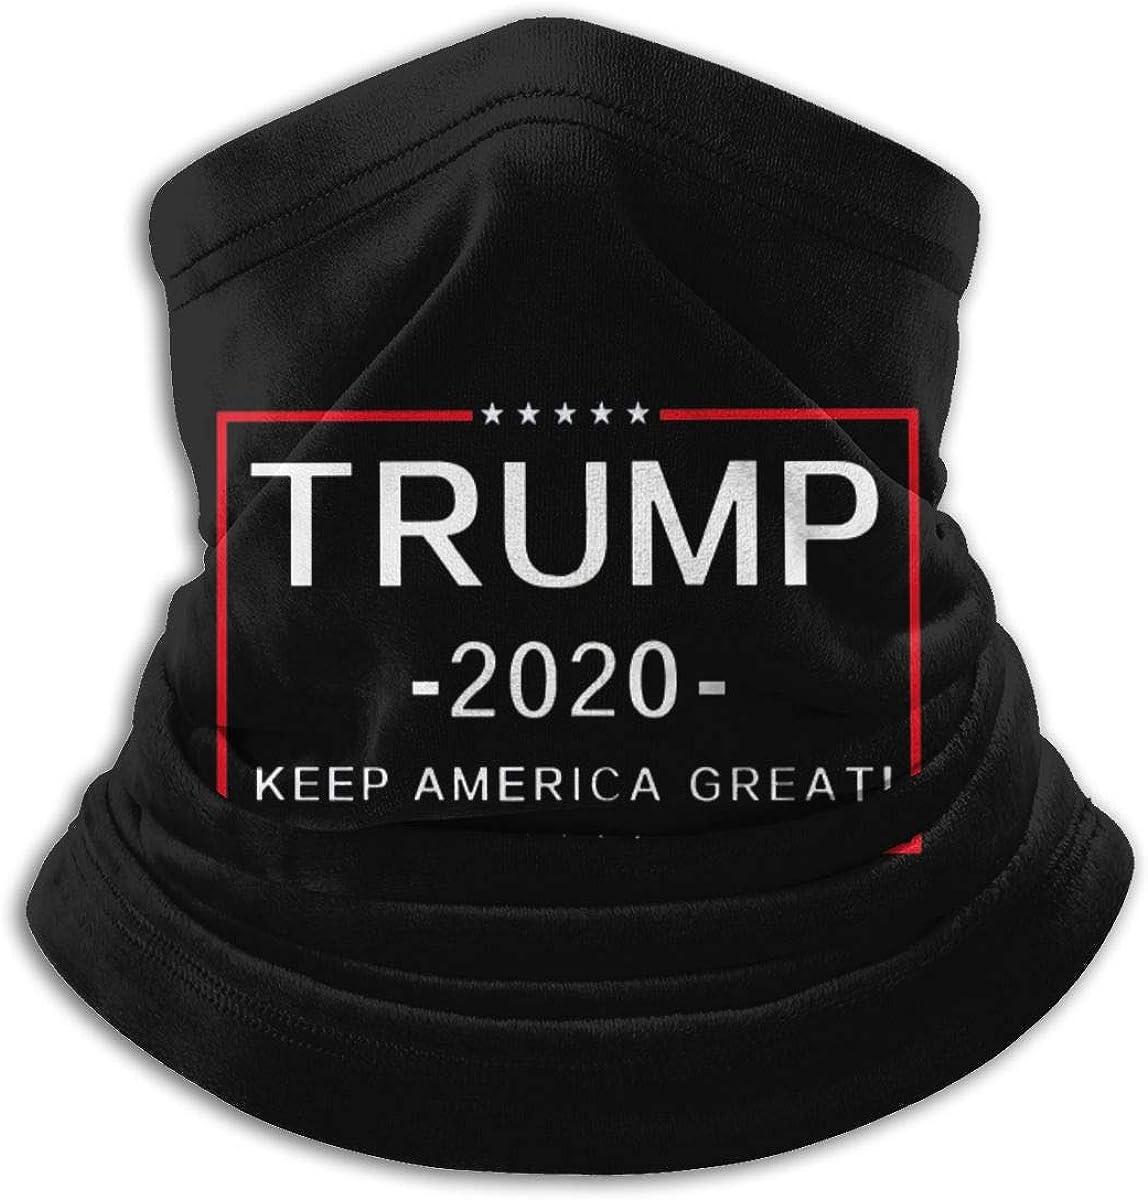 Trump 2020 Black Multi-function Neck Warmer Gaiter Polyester Neck Warmer Windproof Winter Neck Gaiter Cold Weather Scarf For Men Women